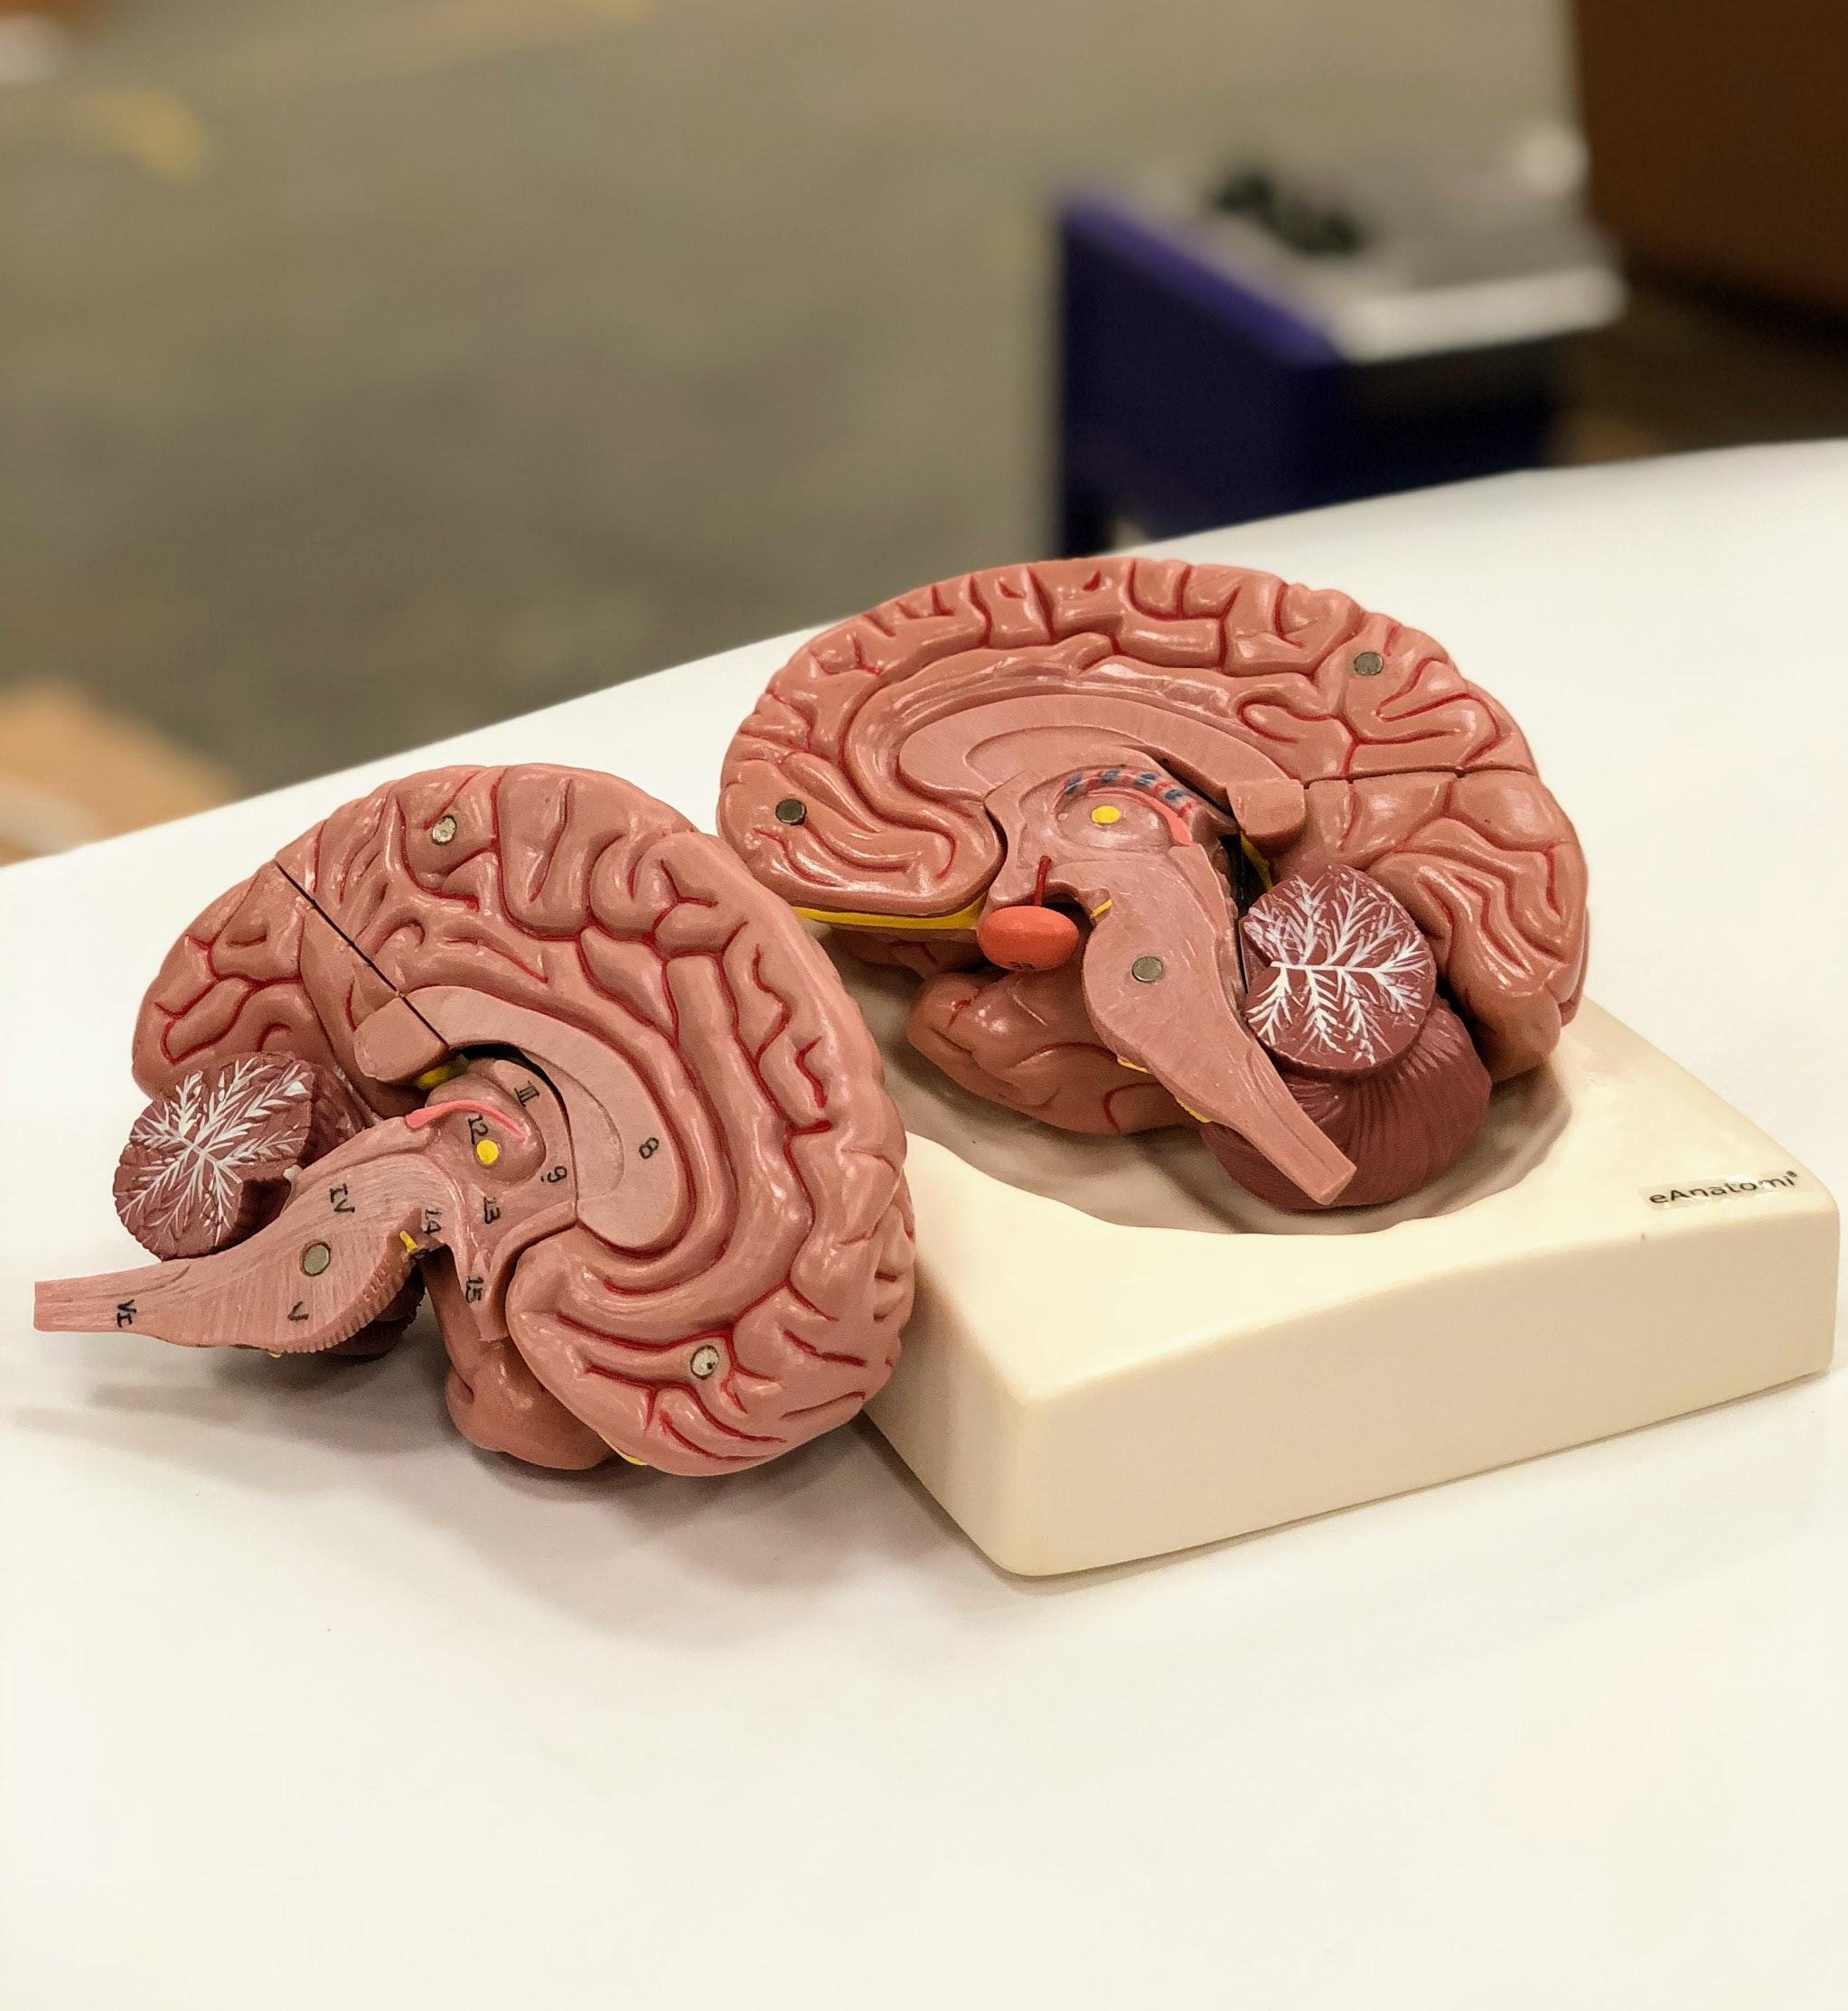 Hjernemodel i 8 dele